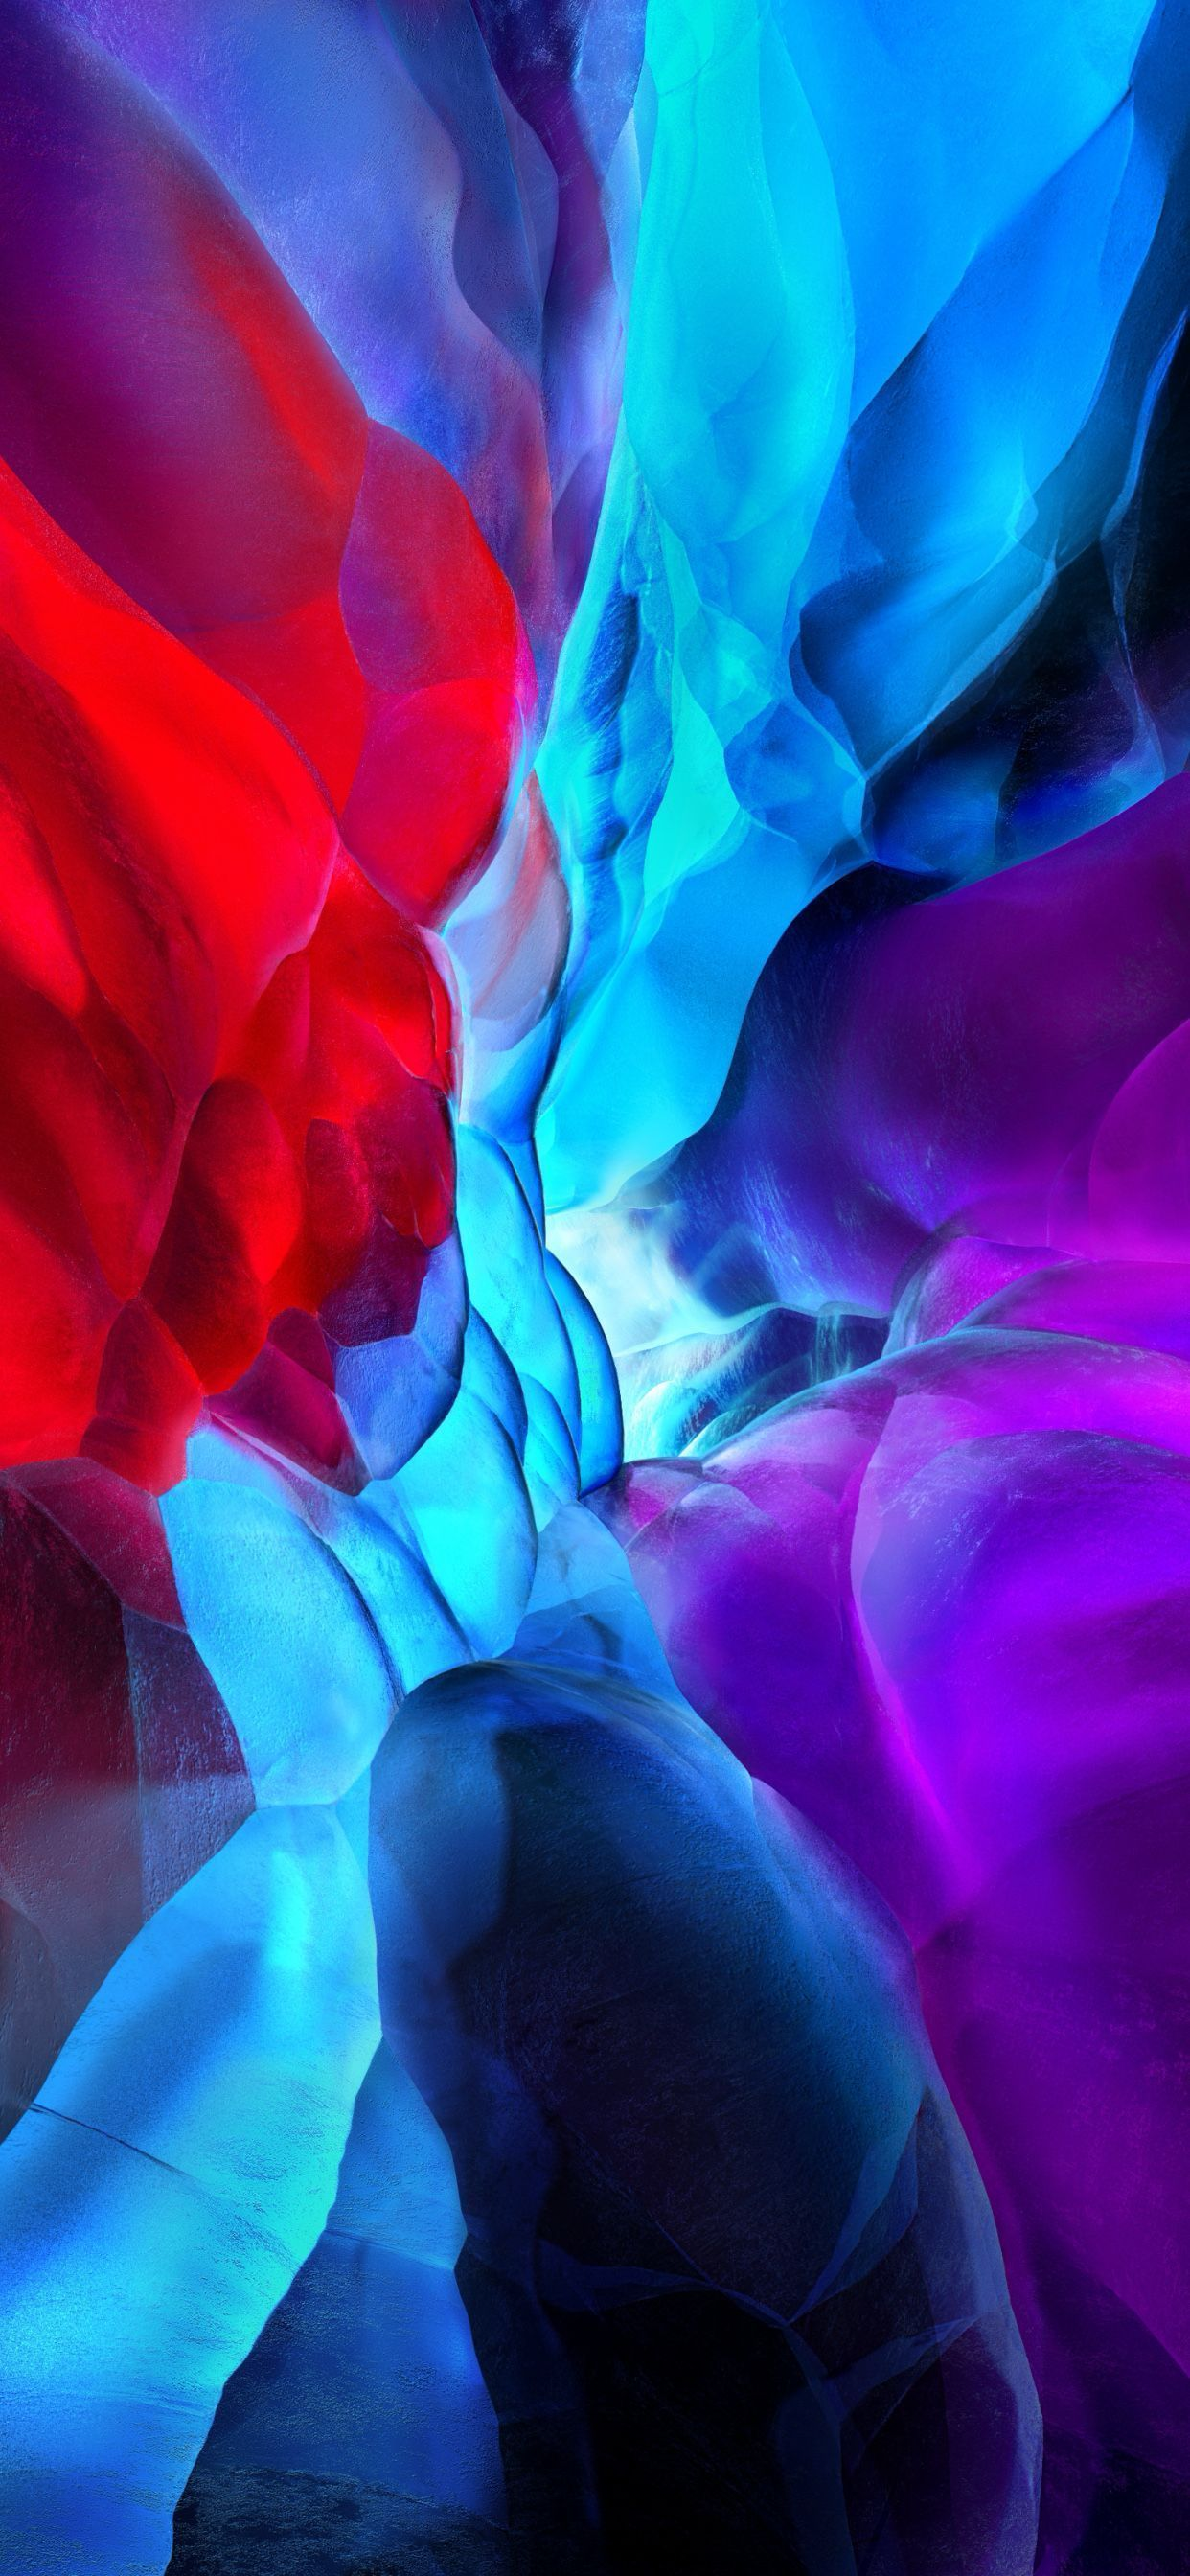 Herunterladen Ipad Pro 2020 Wallpaper Hier Full Hd Auflosung 1436 X 3113 Pixel Hd Apple Ipad Ipad Pro Wallpaper Ipad Pro Wallpaper Hd Apple Ipad Wallpaper Ideas for wallpaper ipad pro 11 images